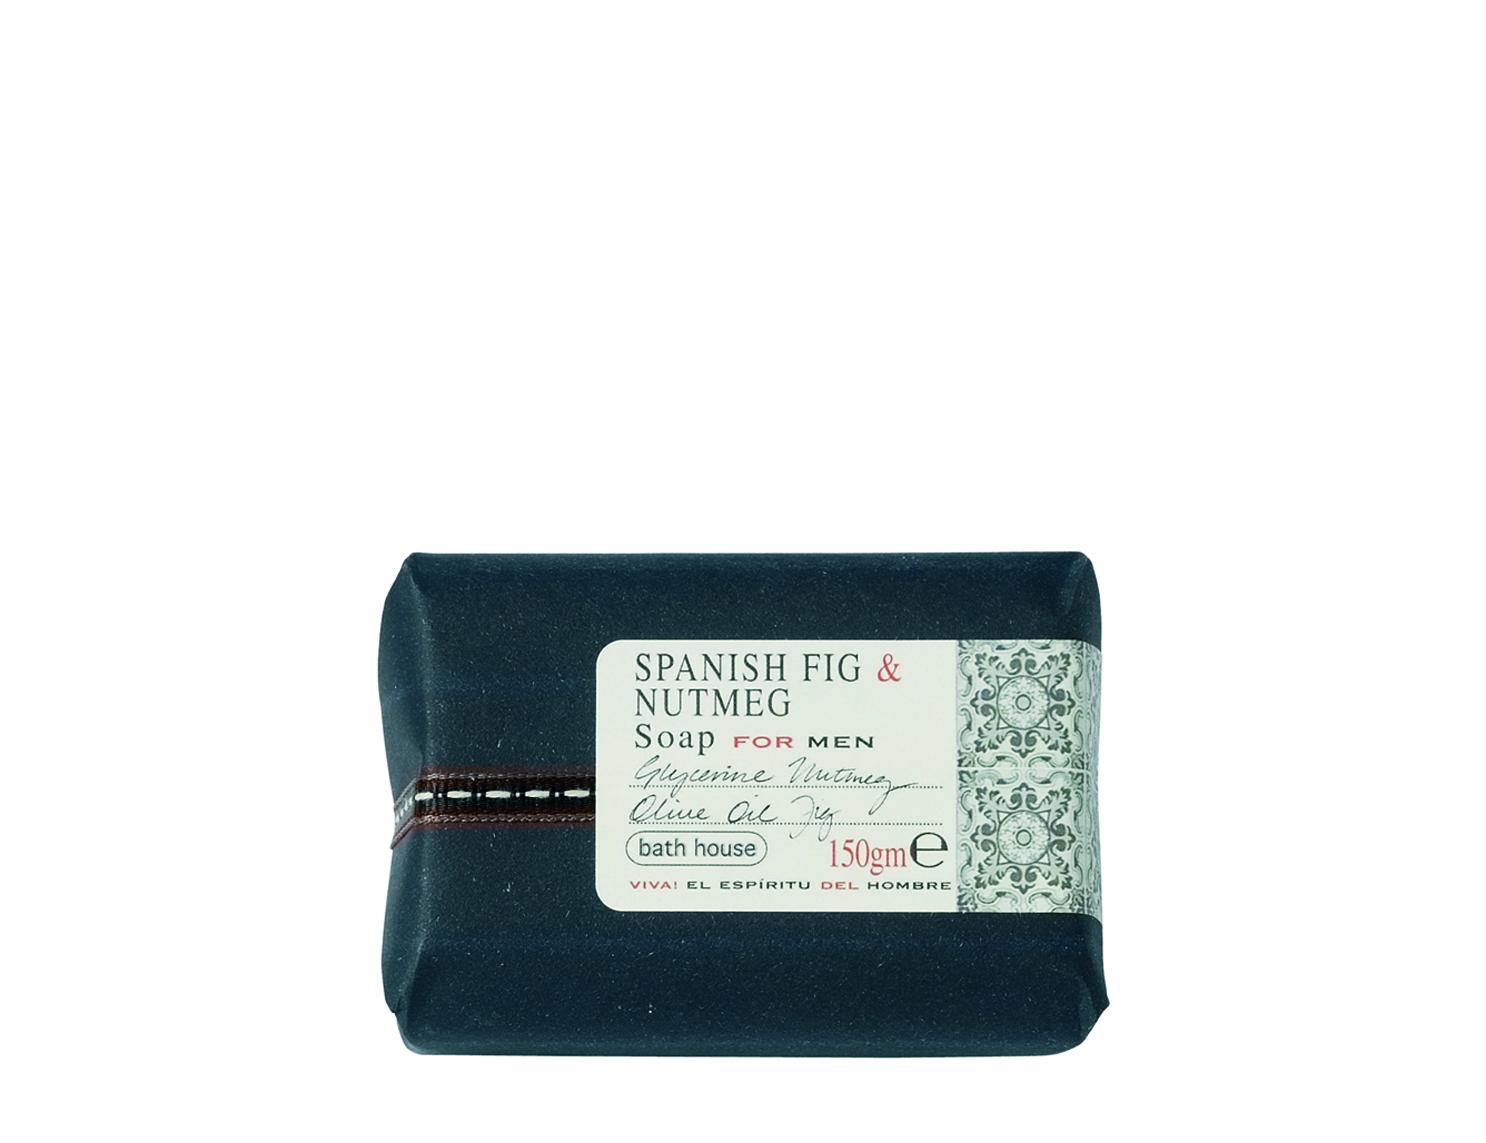 Spanish Fig & Nutmeg Soap  £6.25